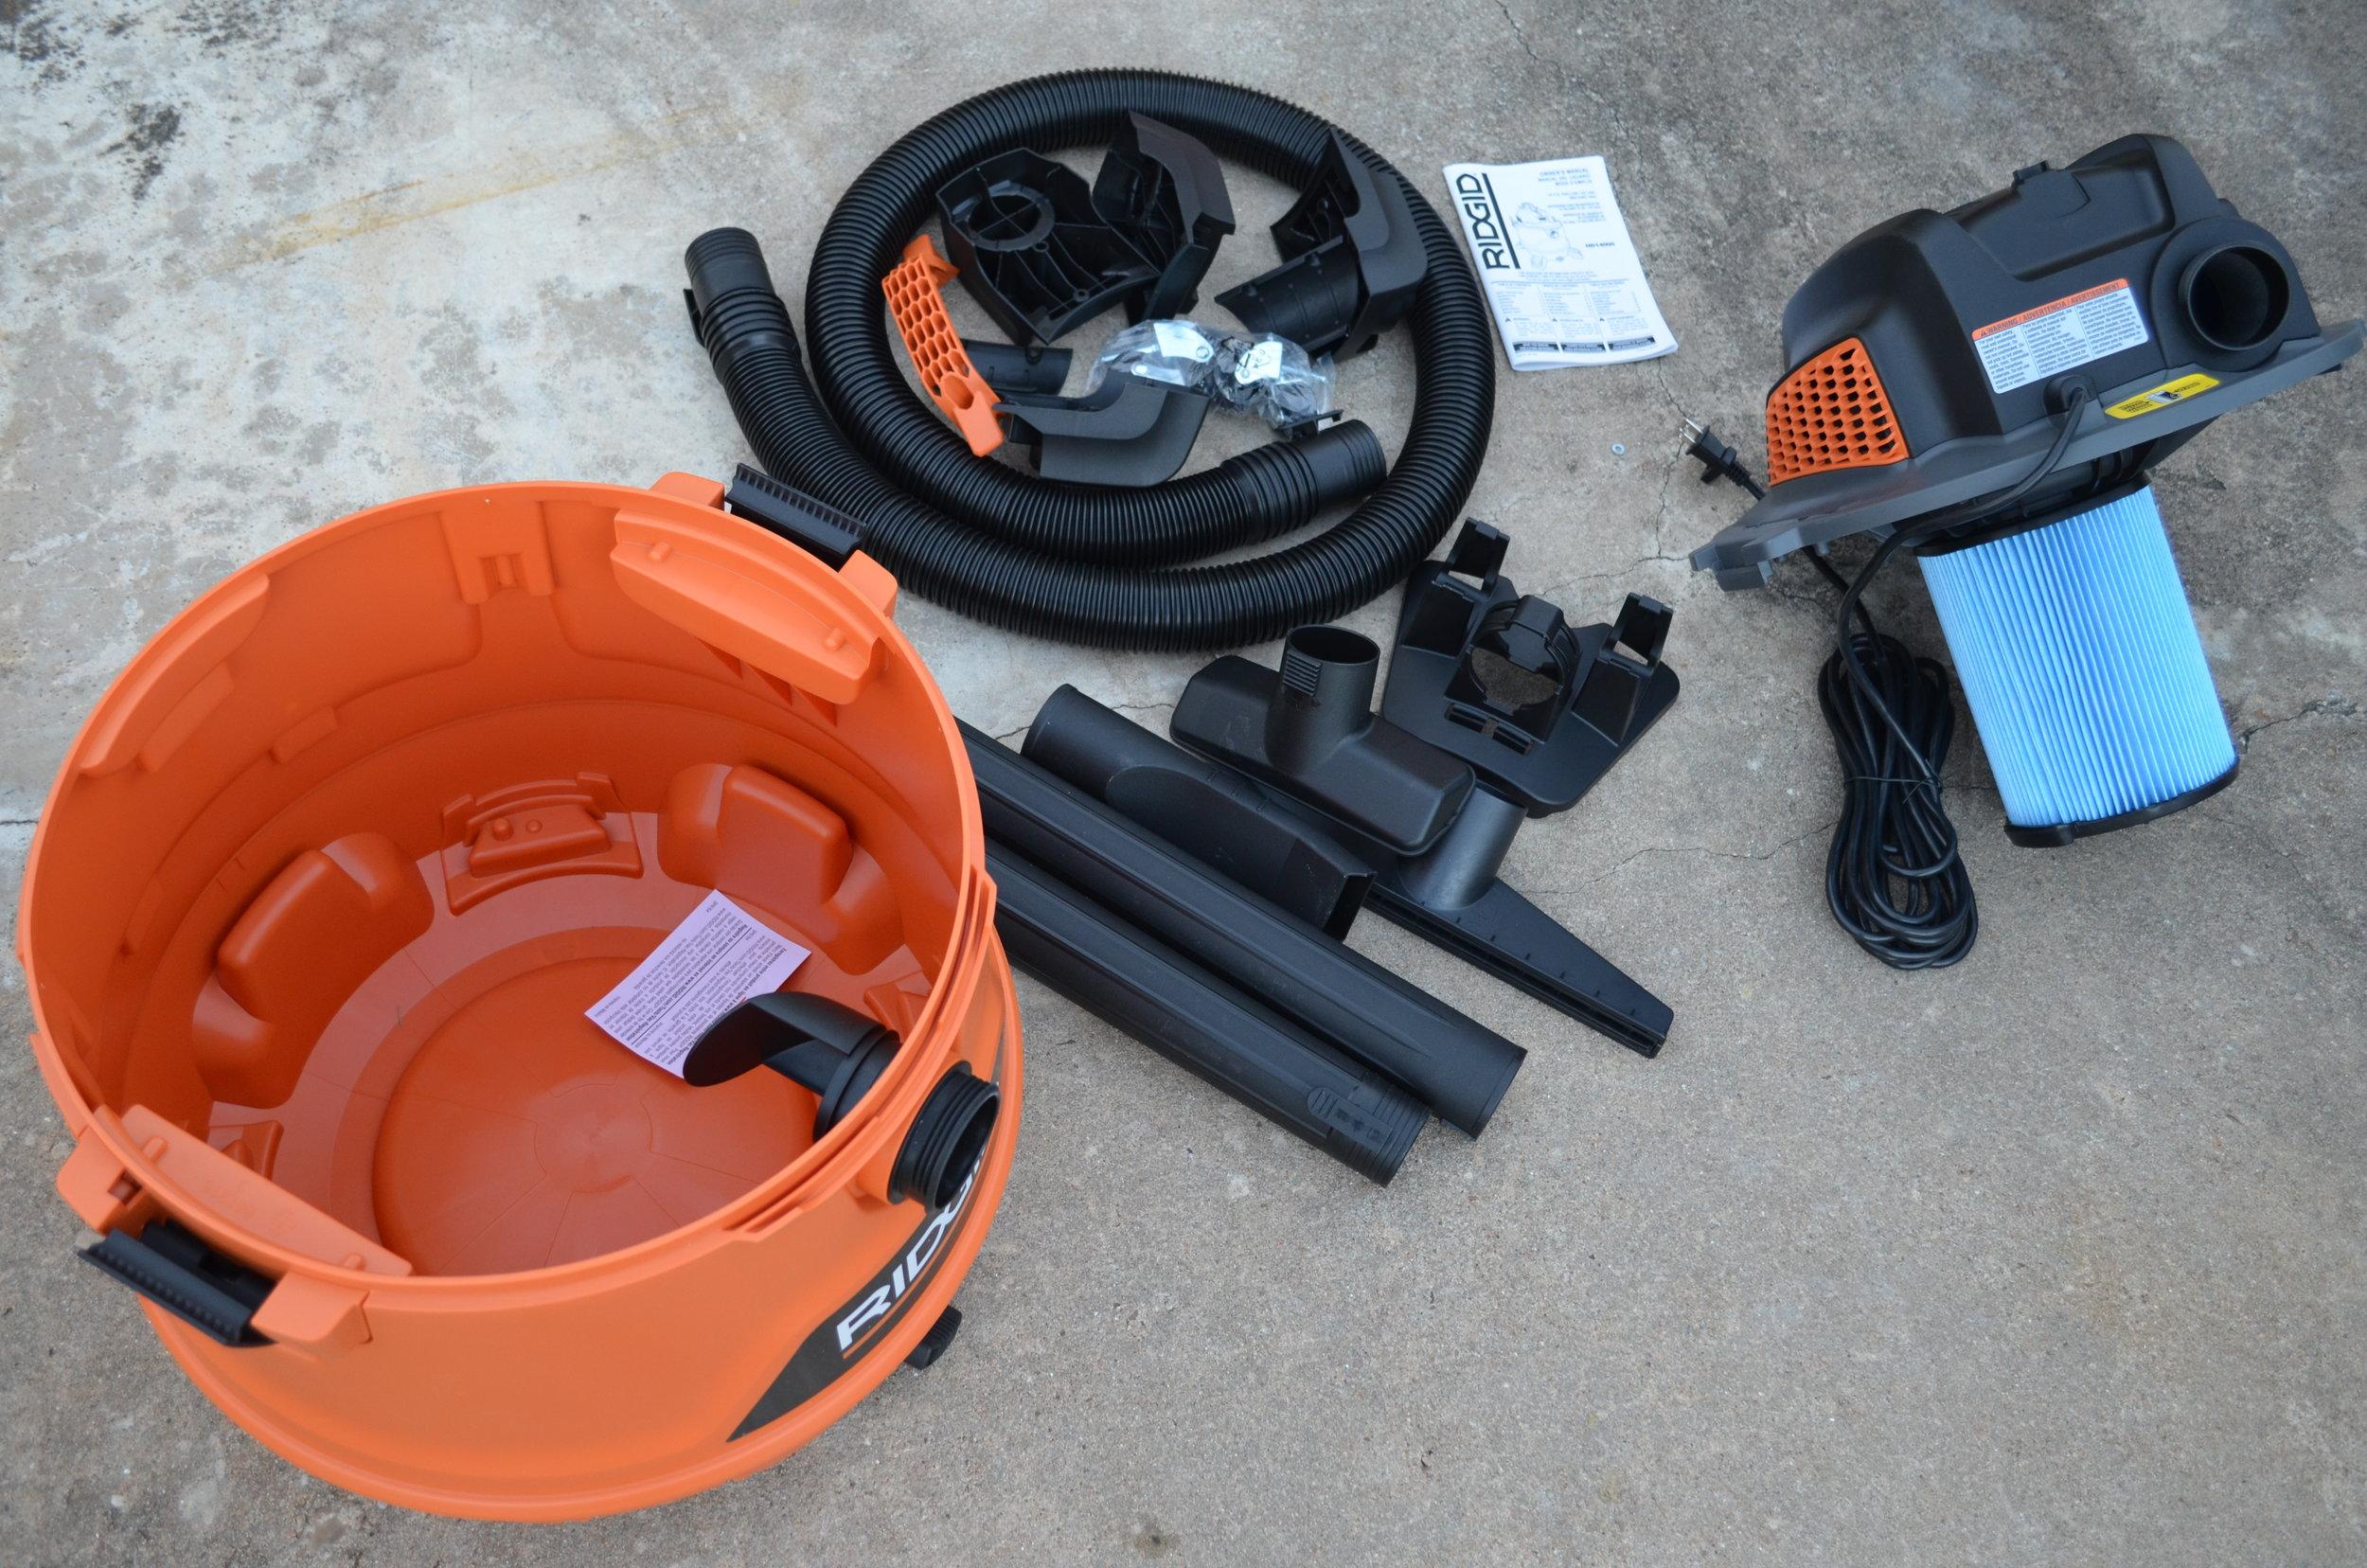 ridgid-nxt-wet-dry-vac-6hp-14gal-parts